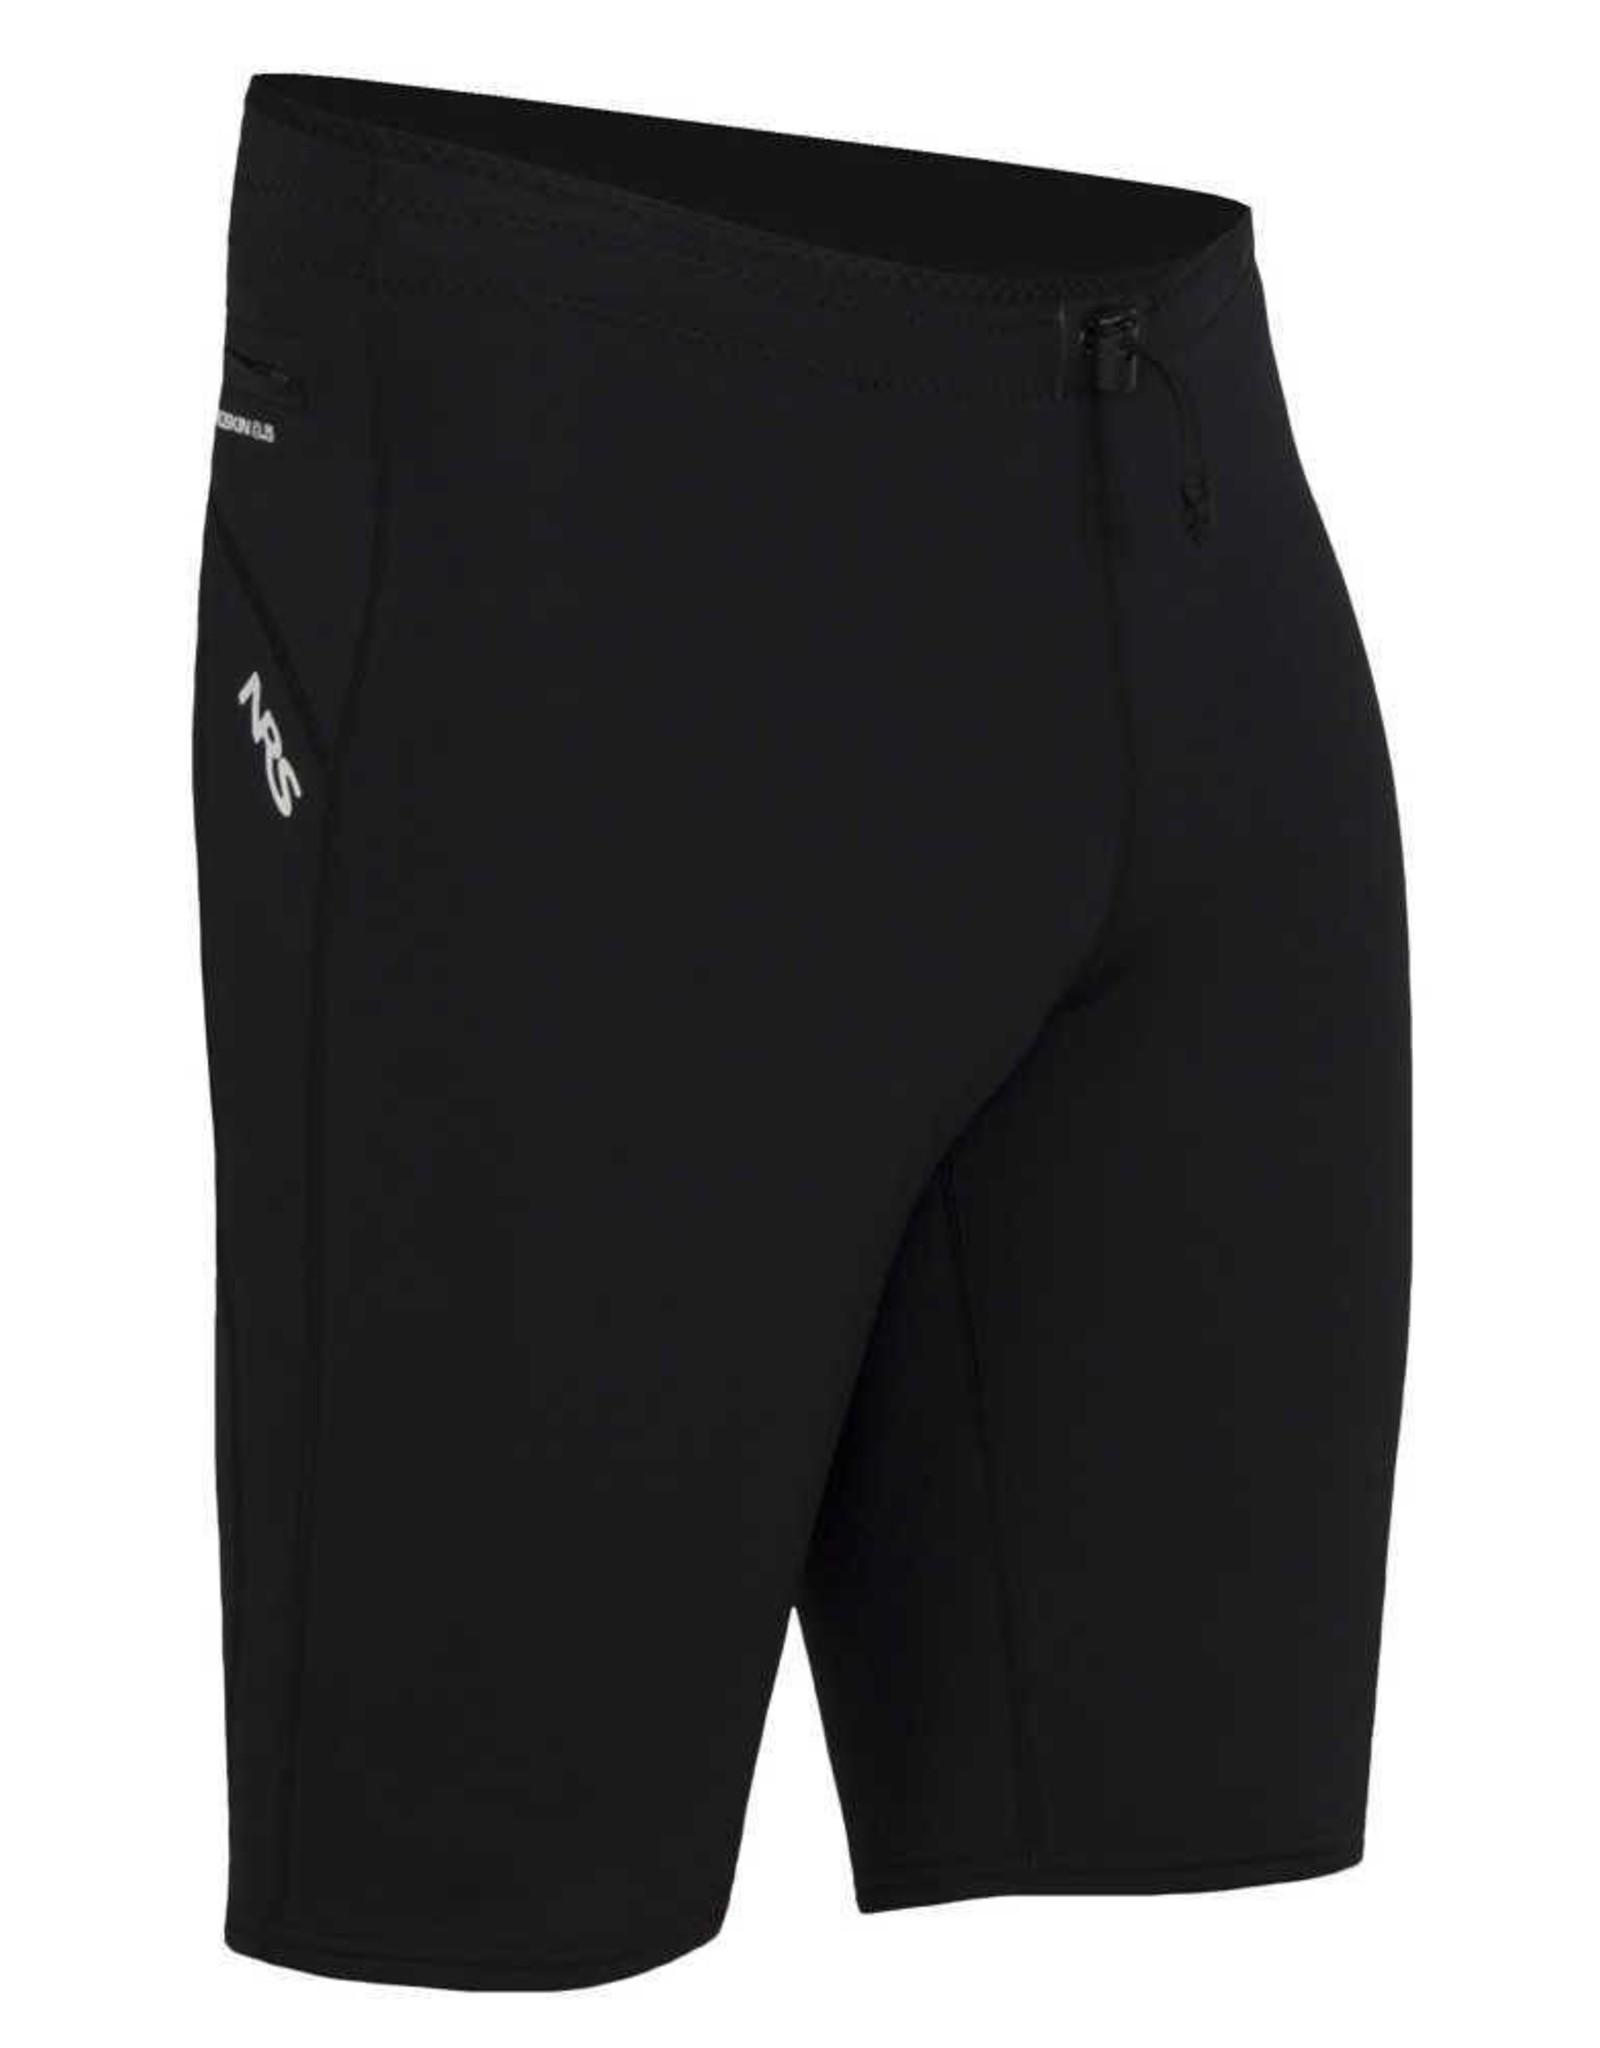 NRS NRS M NeoSkin Shorts